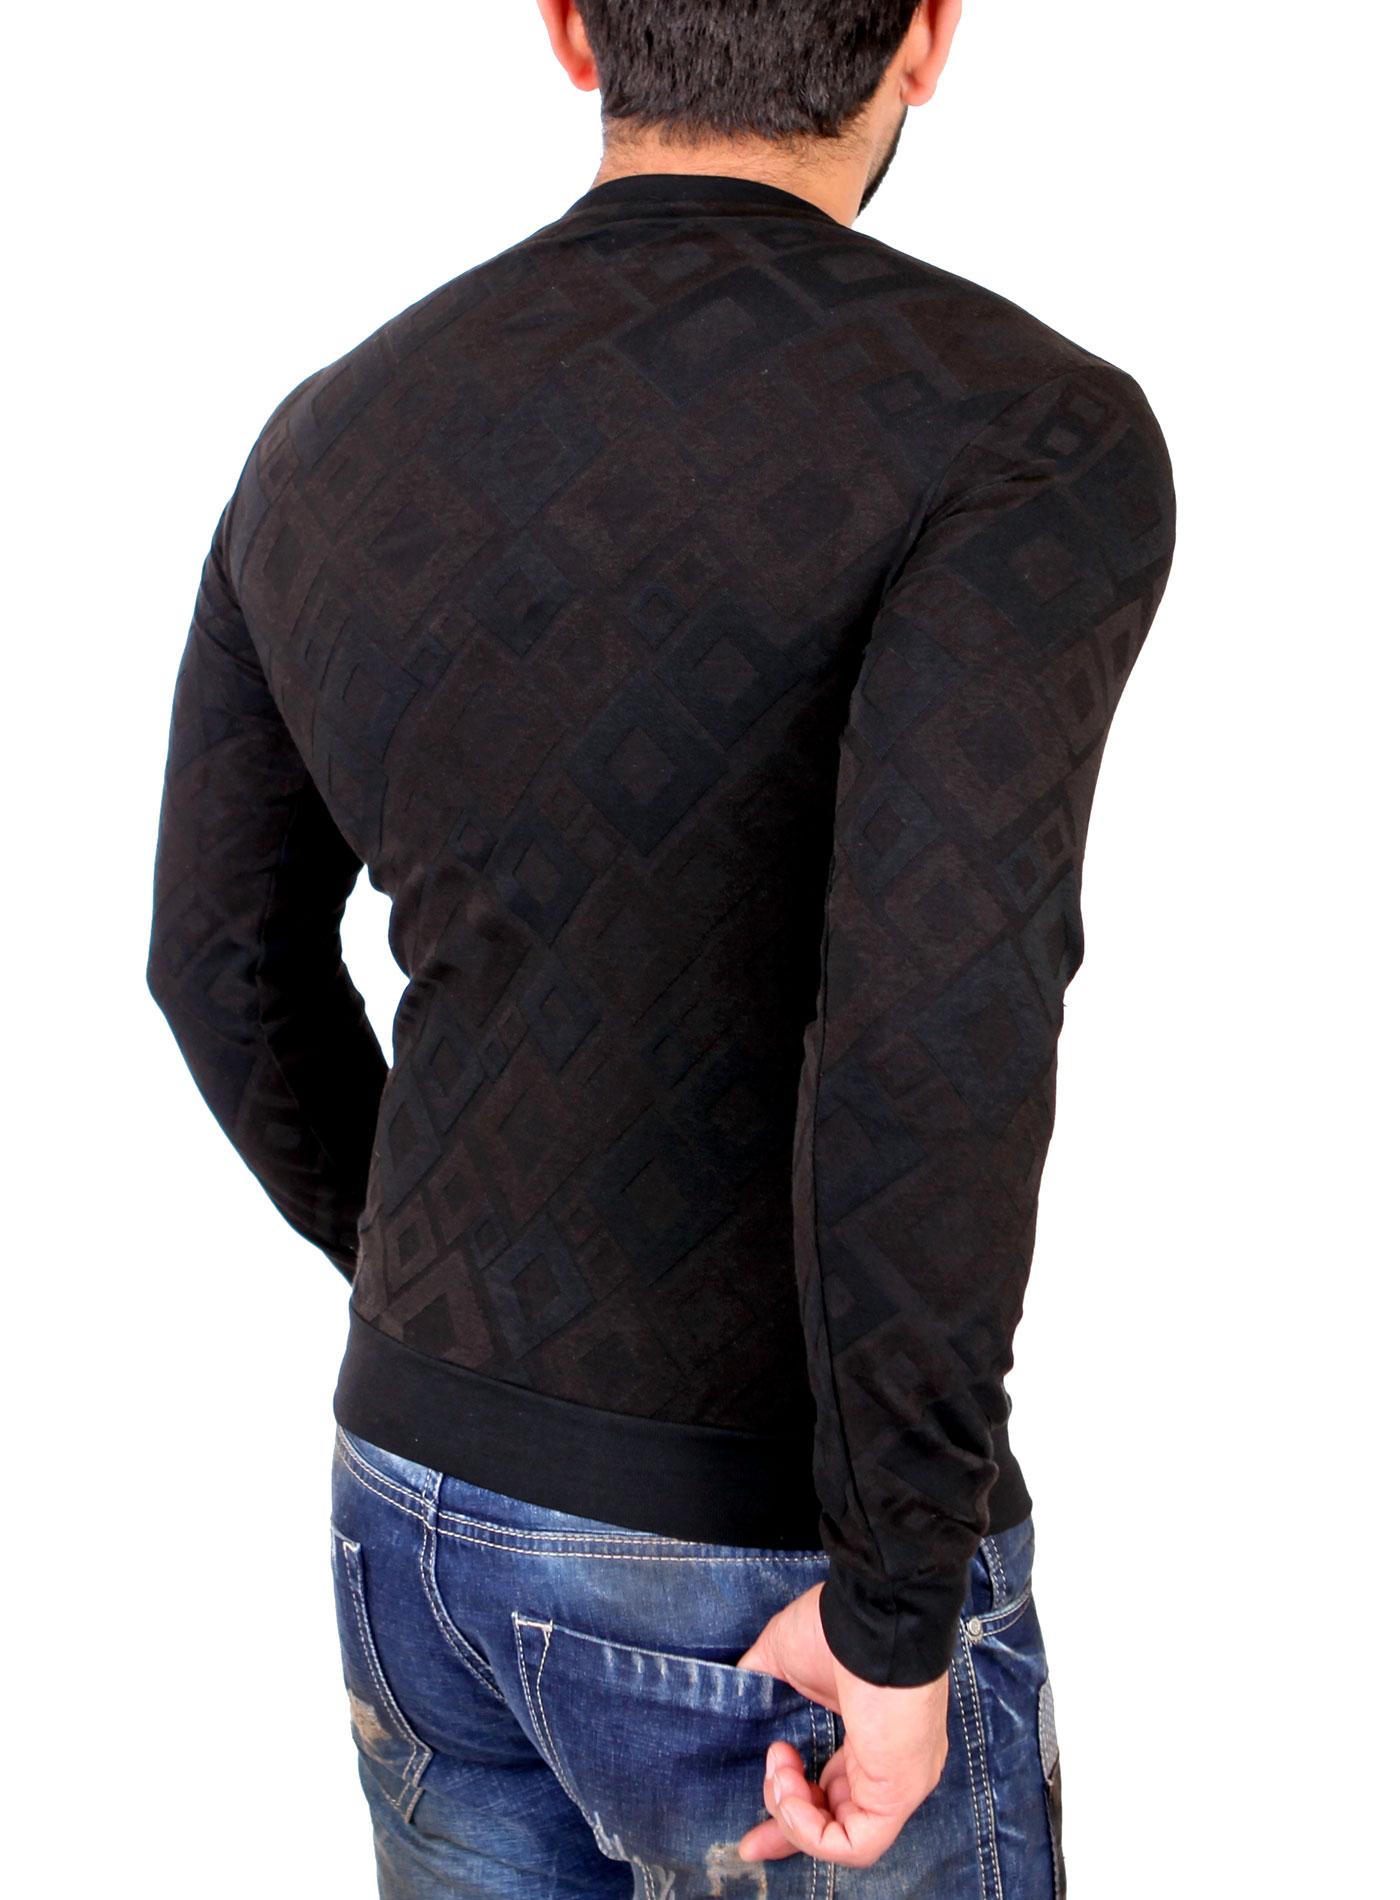 tazzio sweatshirt herren quilt design rundhals pullover tz. Black Bedroom Furniture Sets. Home Design Ideas